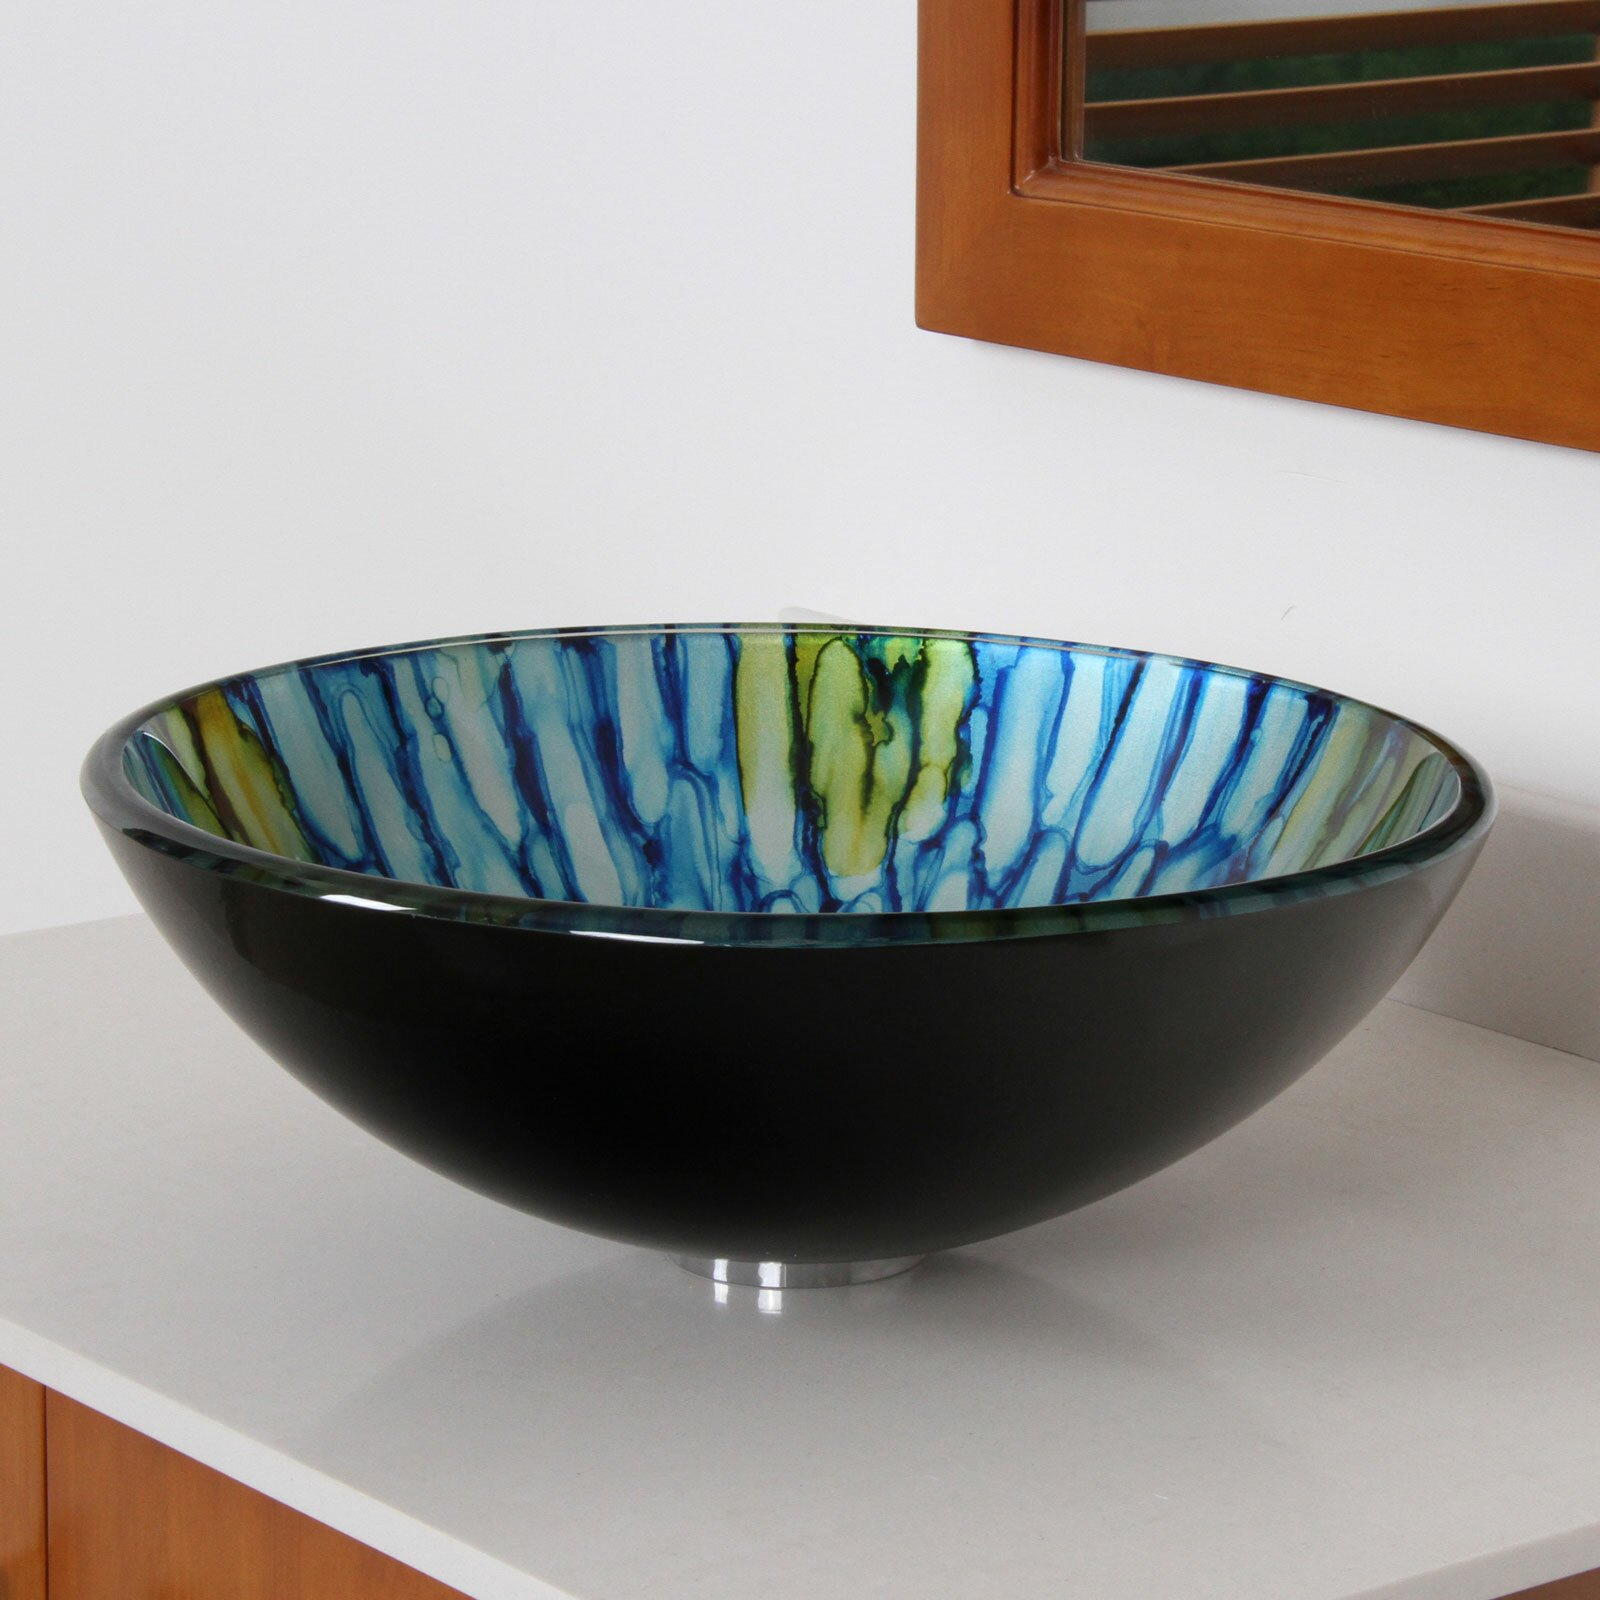 Elite Double Layered Glass Bowl Bathroom Sink & Reviews Wayfair ...